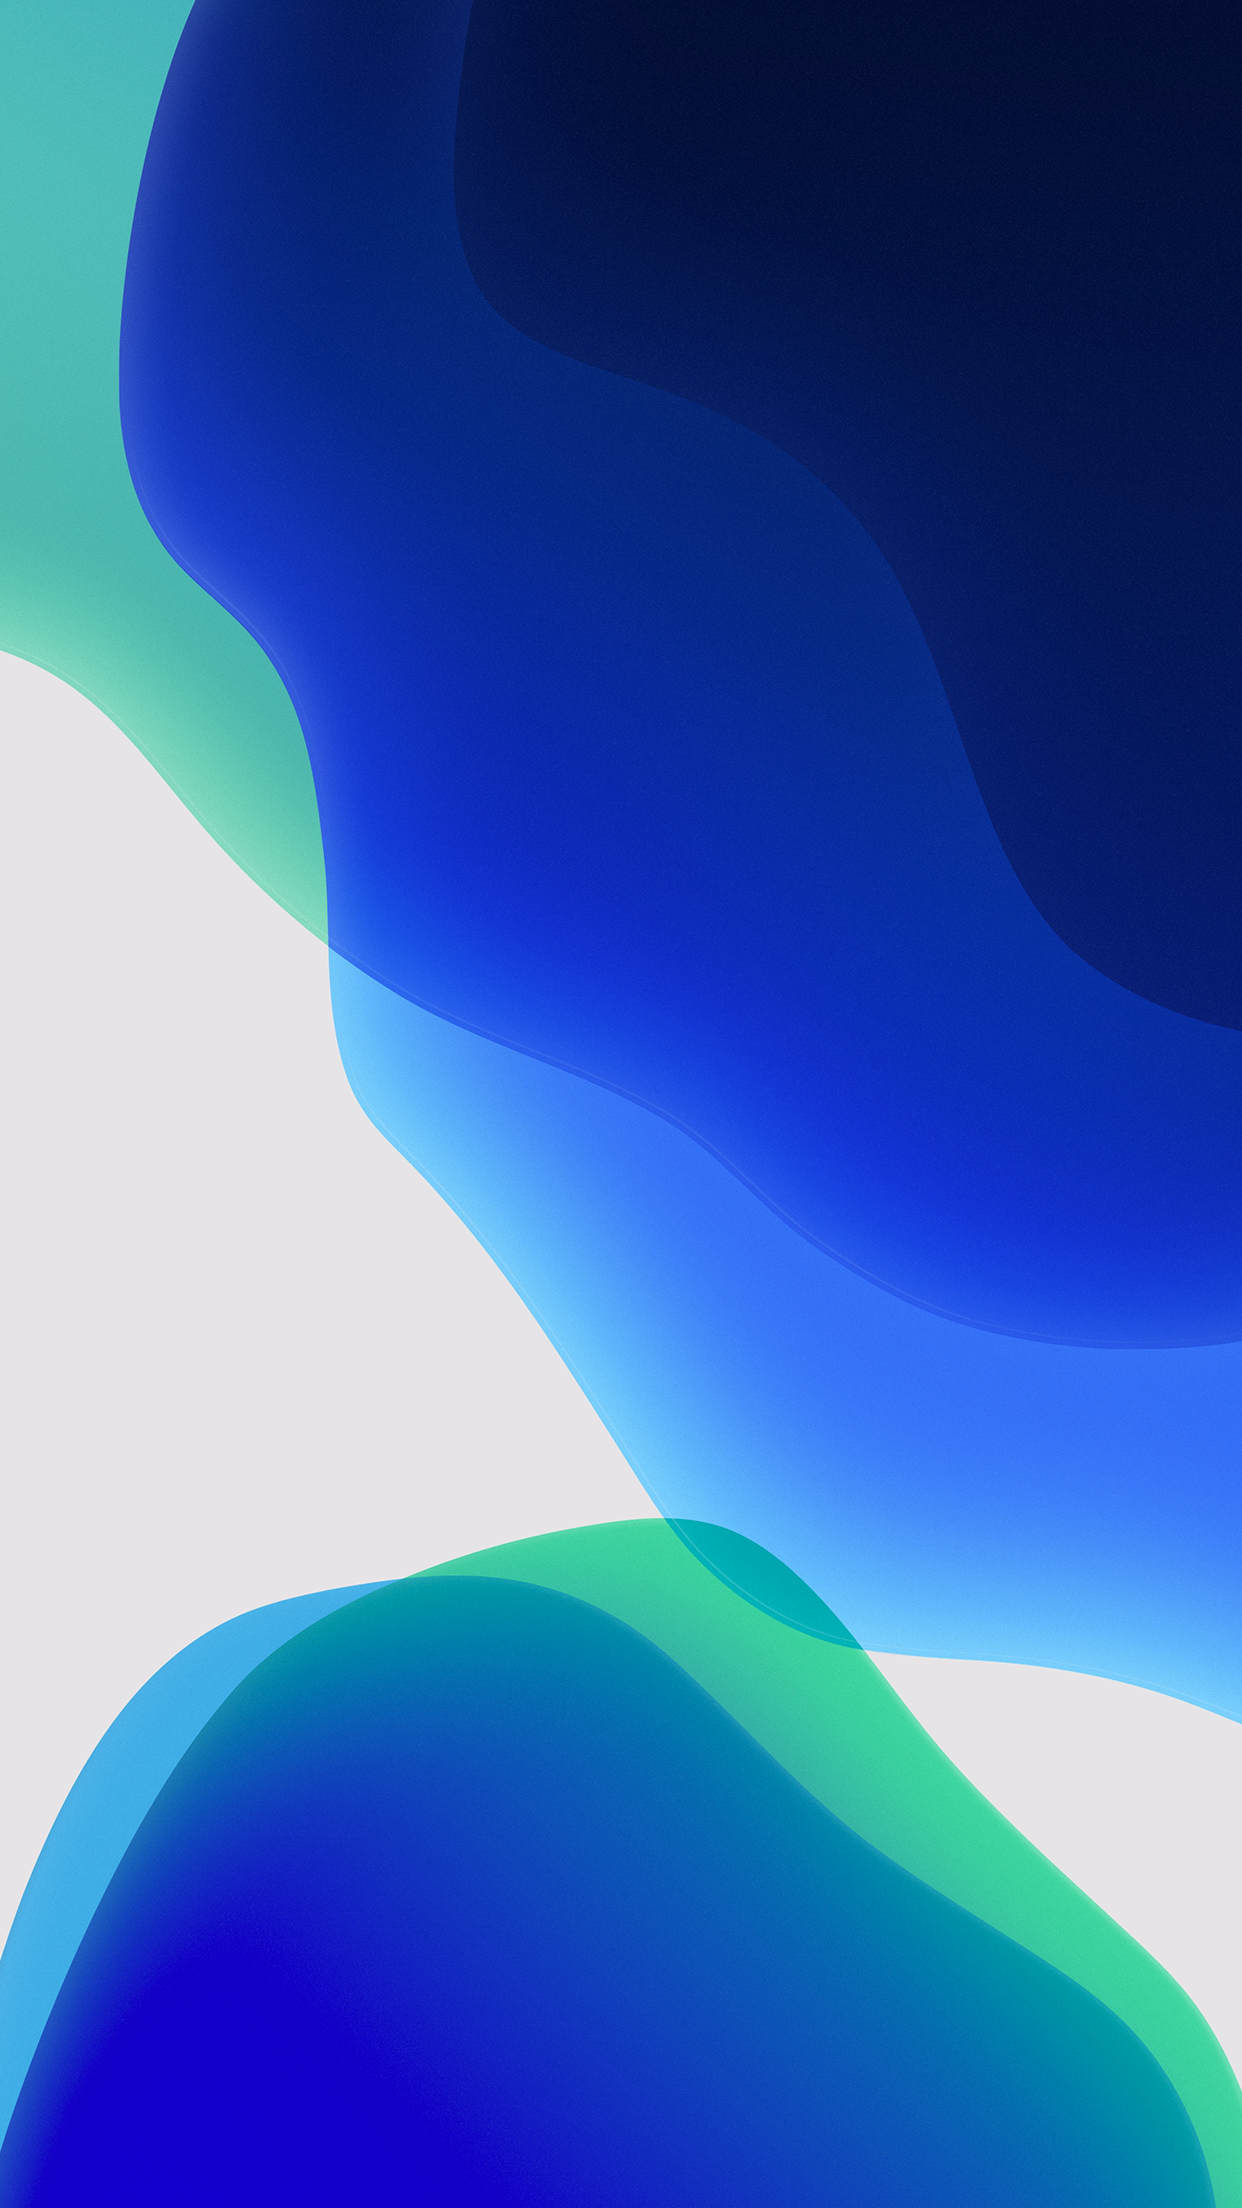 Wallpaper Ios 13 Ios13wallpaper Ios 13 Wallpapers Light Blue Dark Blue Ios13wallpaper Ios Wallpapers Stock Wallpaper Apple Ios